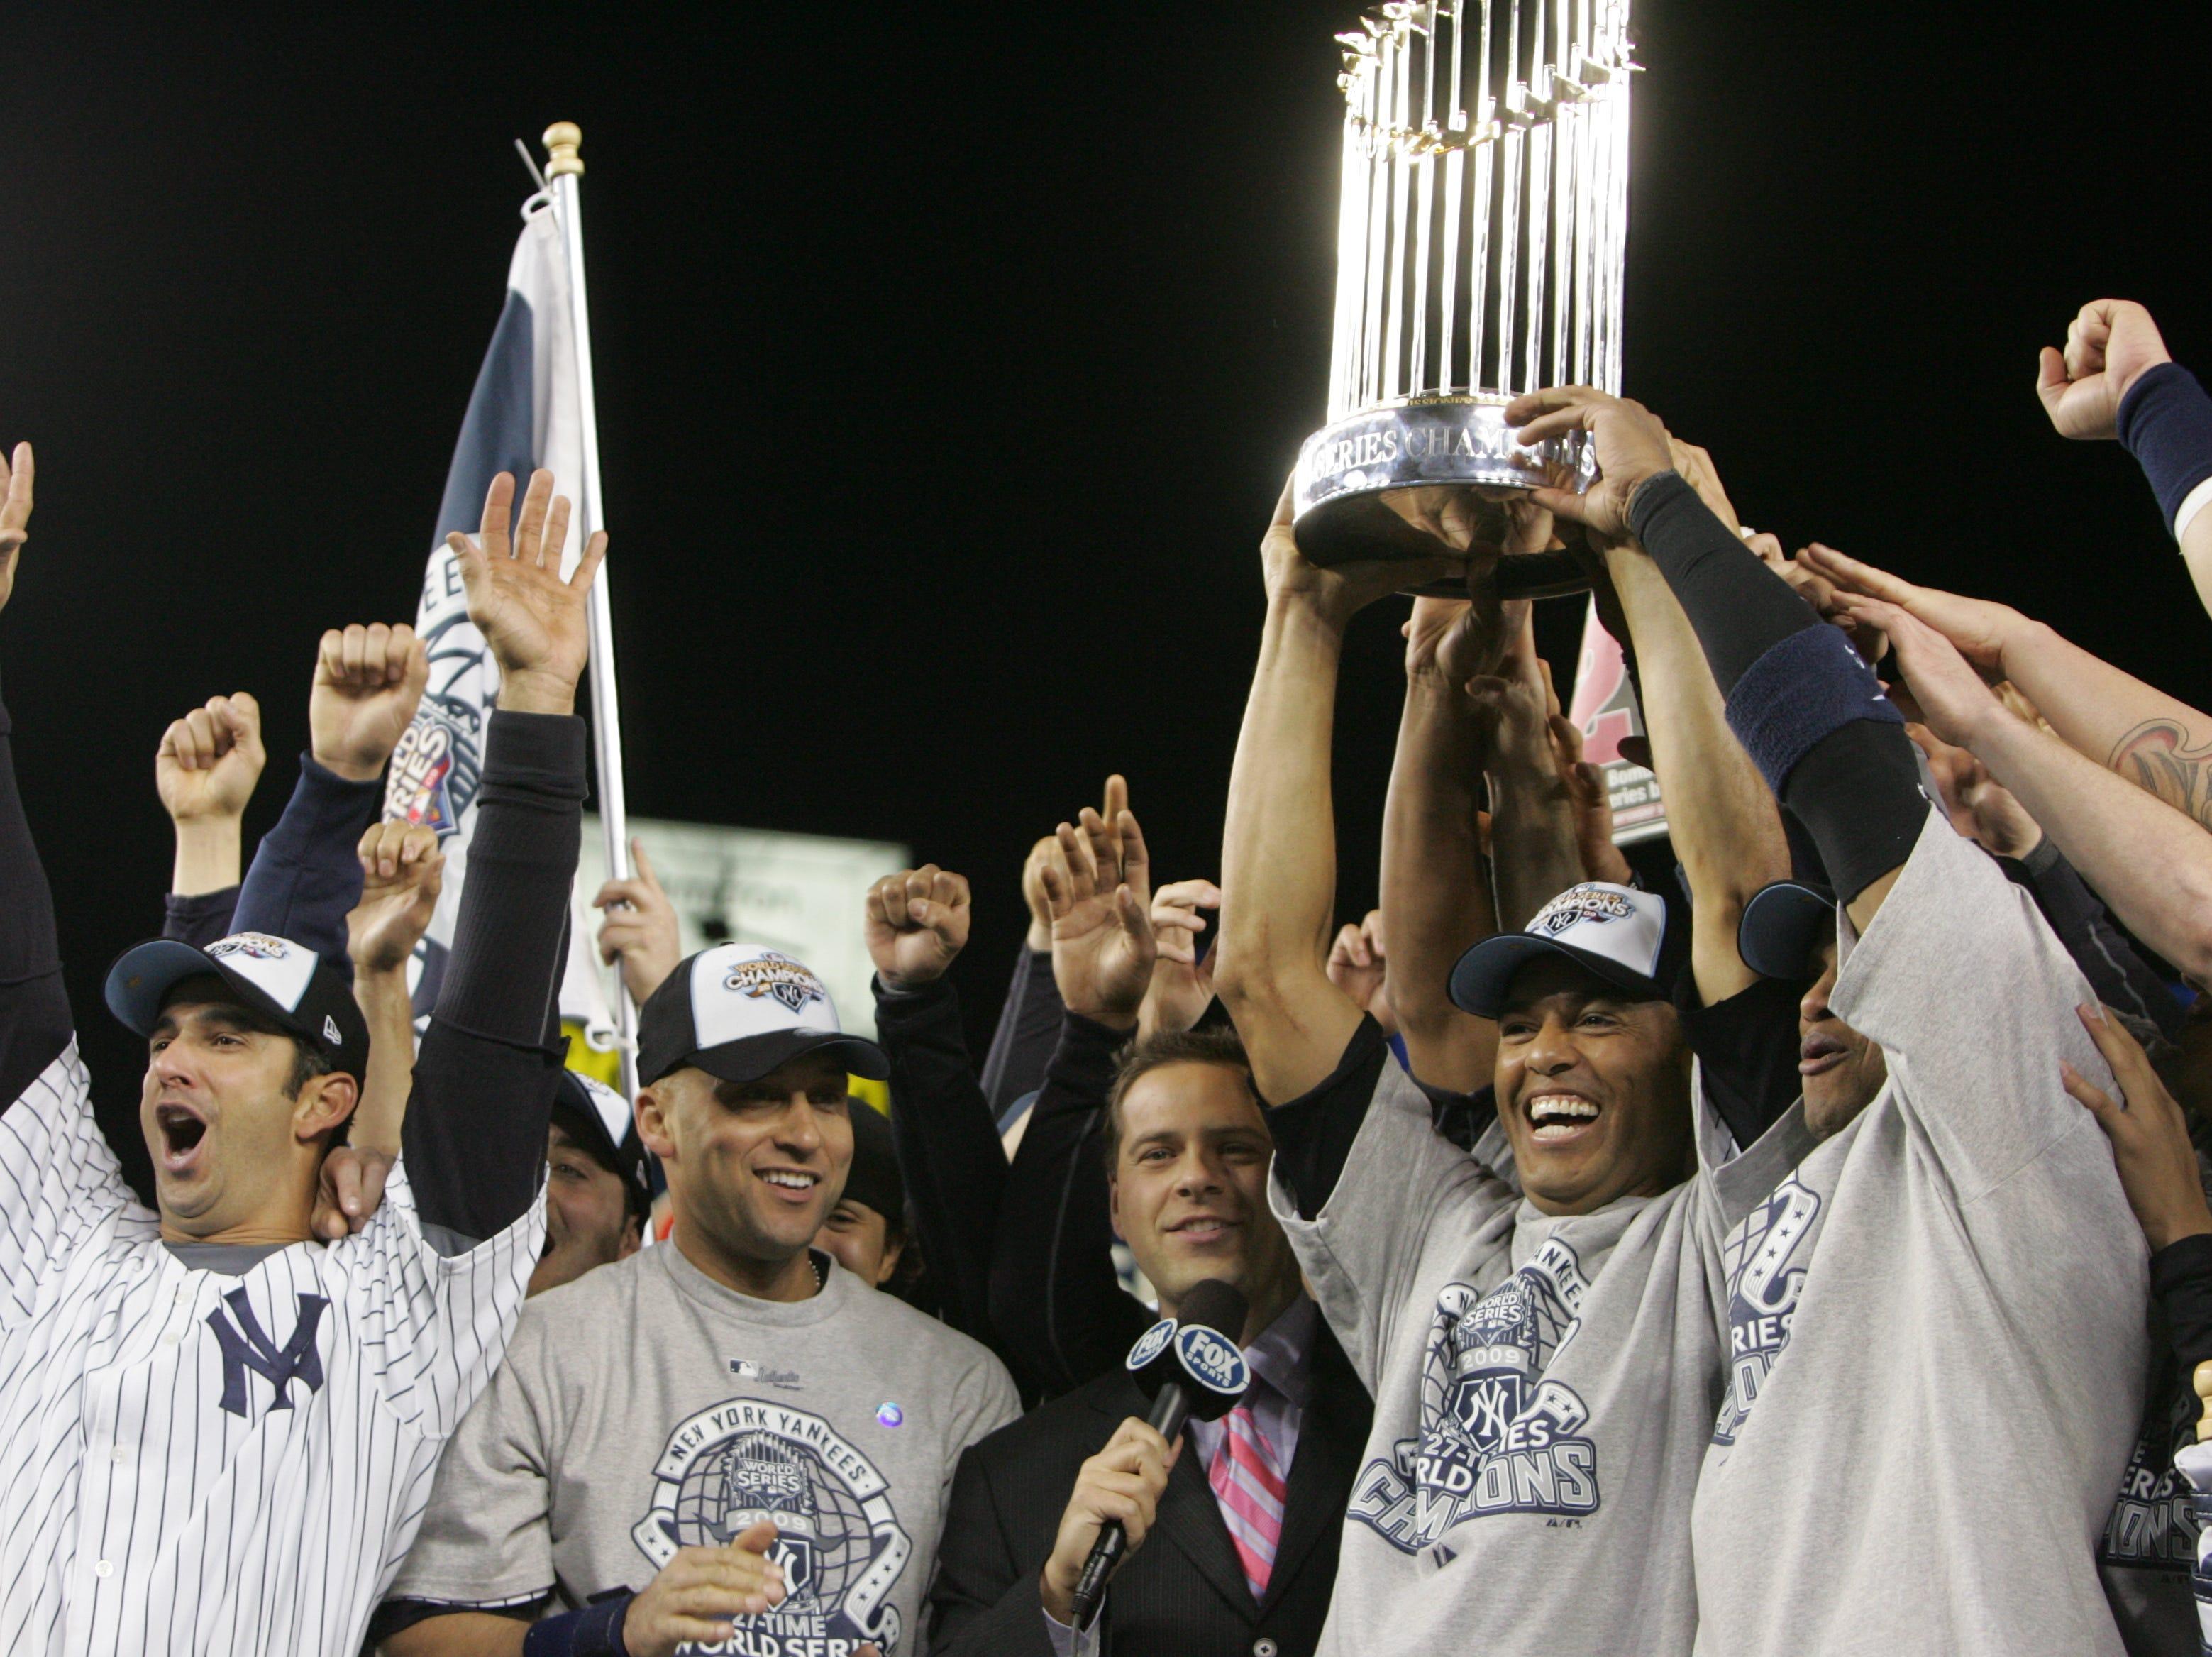 Yankees celebrate their World Series Championship. Jorge Posada, Derek Jeter and Mariano Rivera during the trophy presentation.